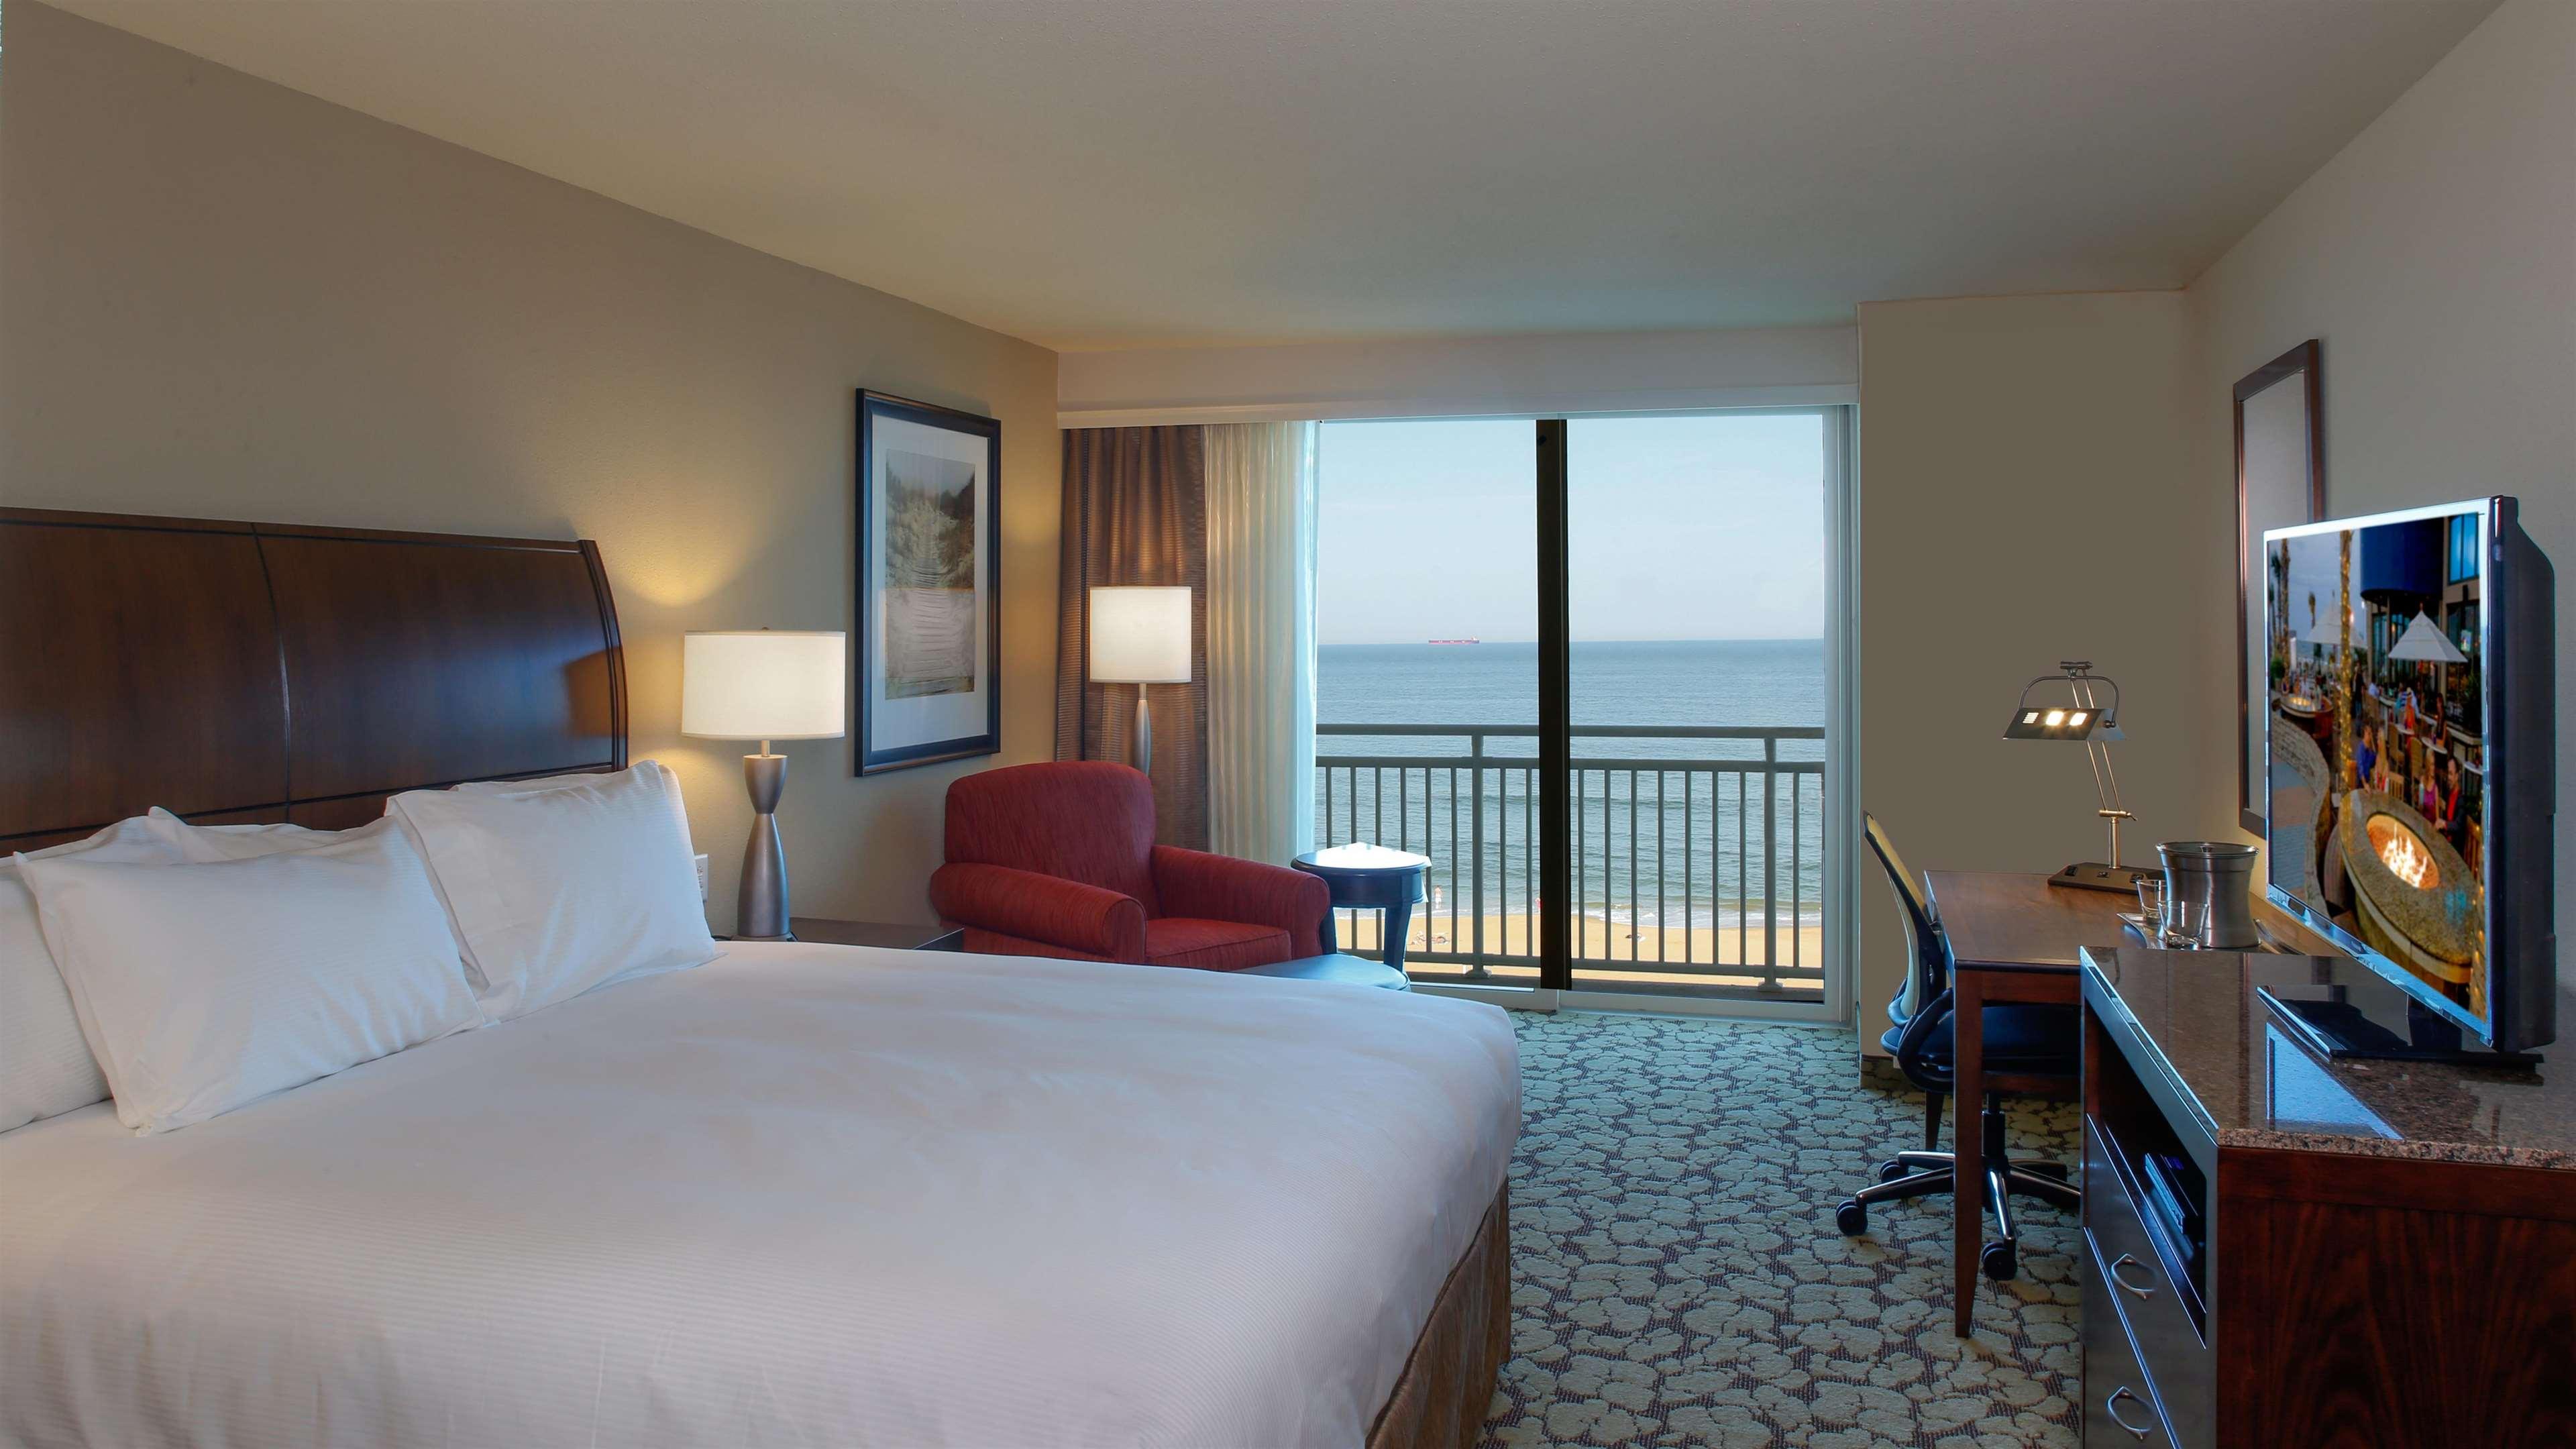 Hilton Garden Inn Virginia Beach Oceanfront image 25